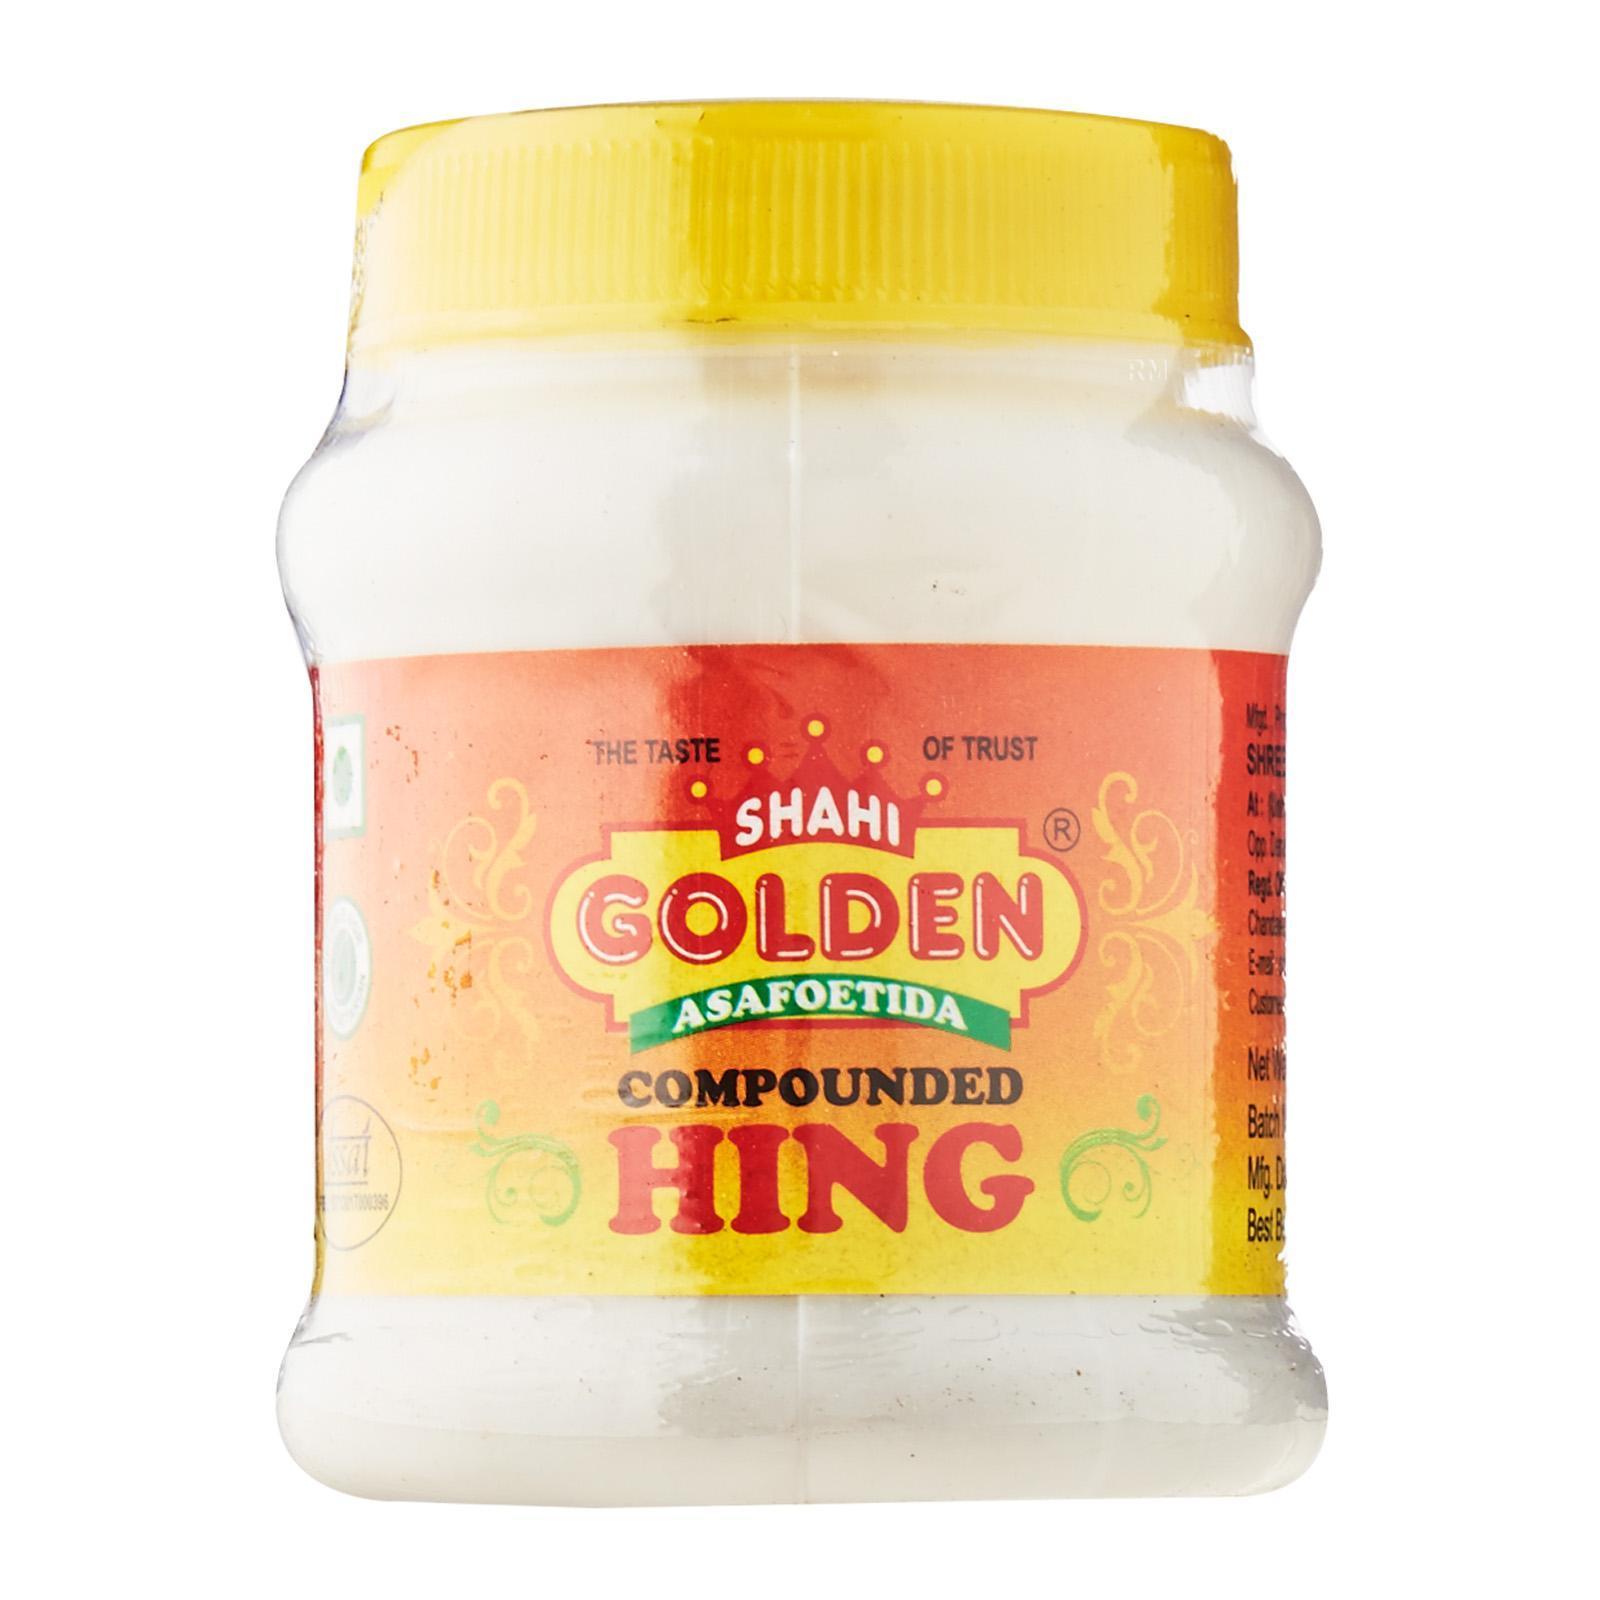 Shahi Golden Hing (Asafoetida) - By Shivsagar Trading